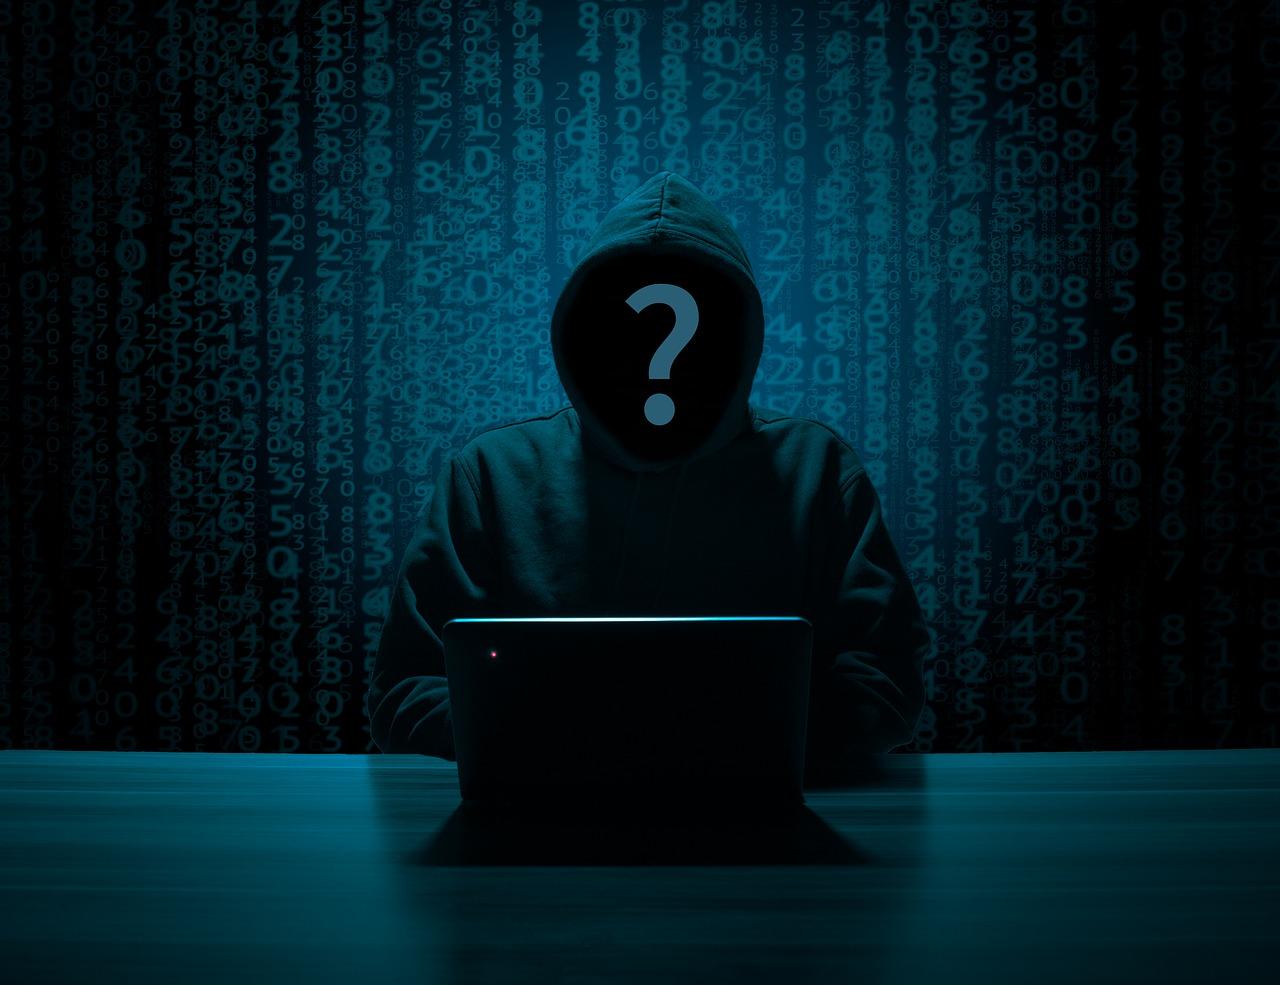 Roblox Ice Valk Scam Stealing Account Credentials